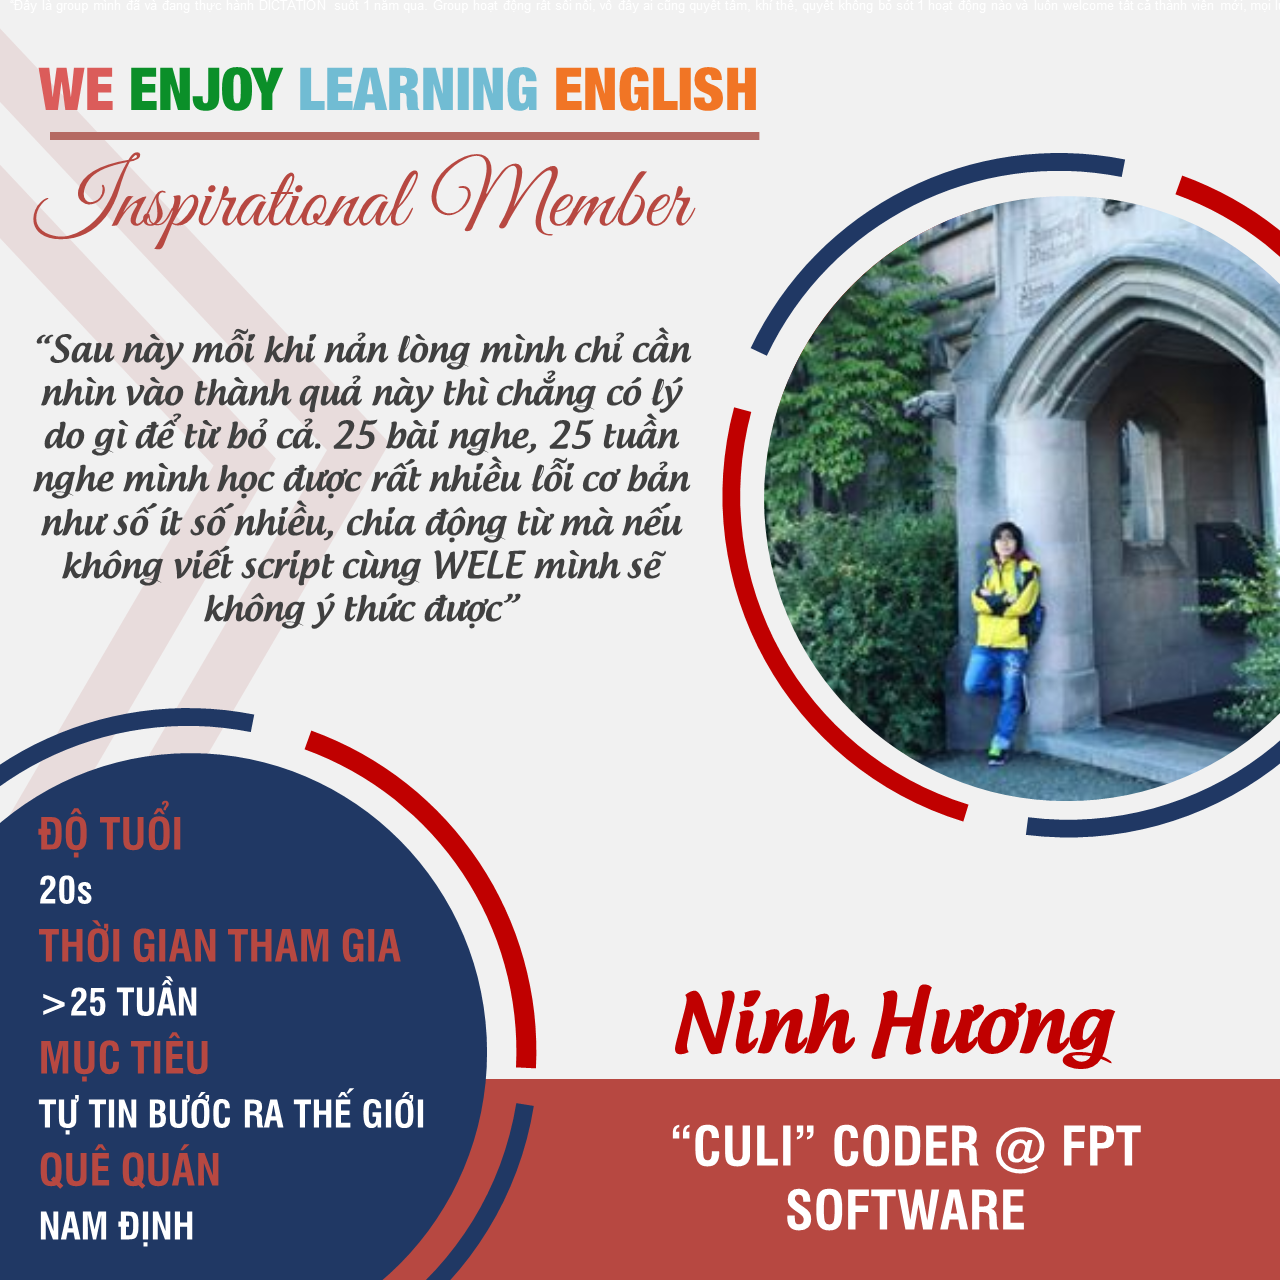 WELE_Inspirational_Member_Ninh_Hương